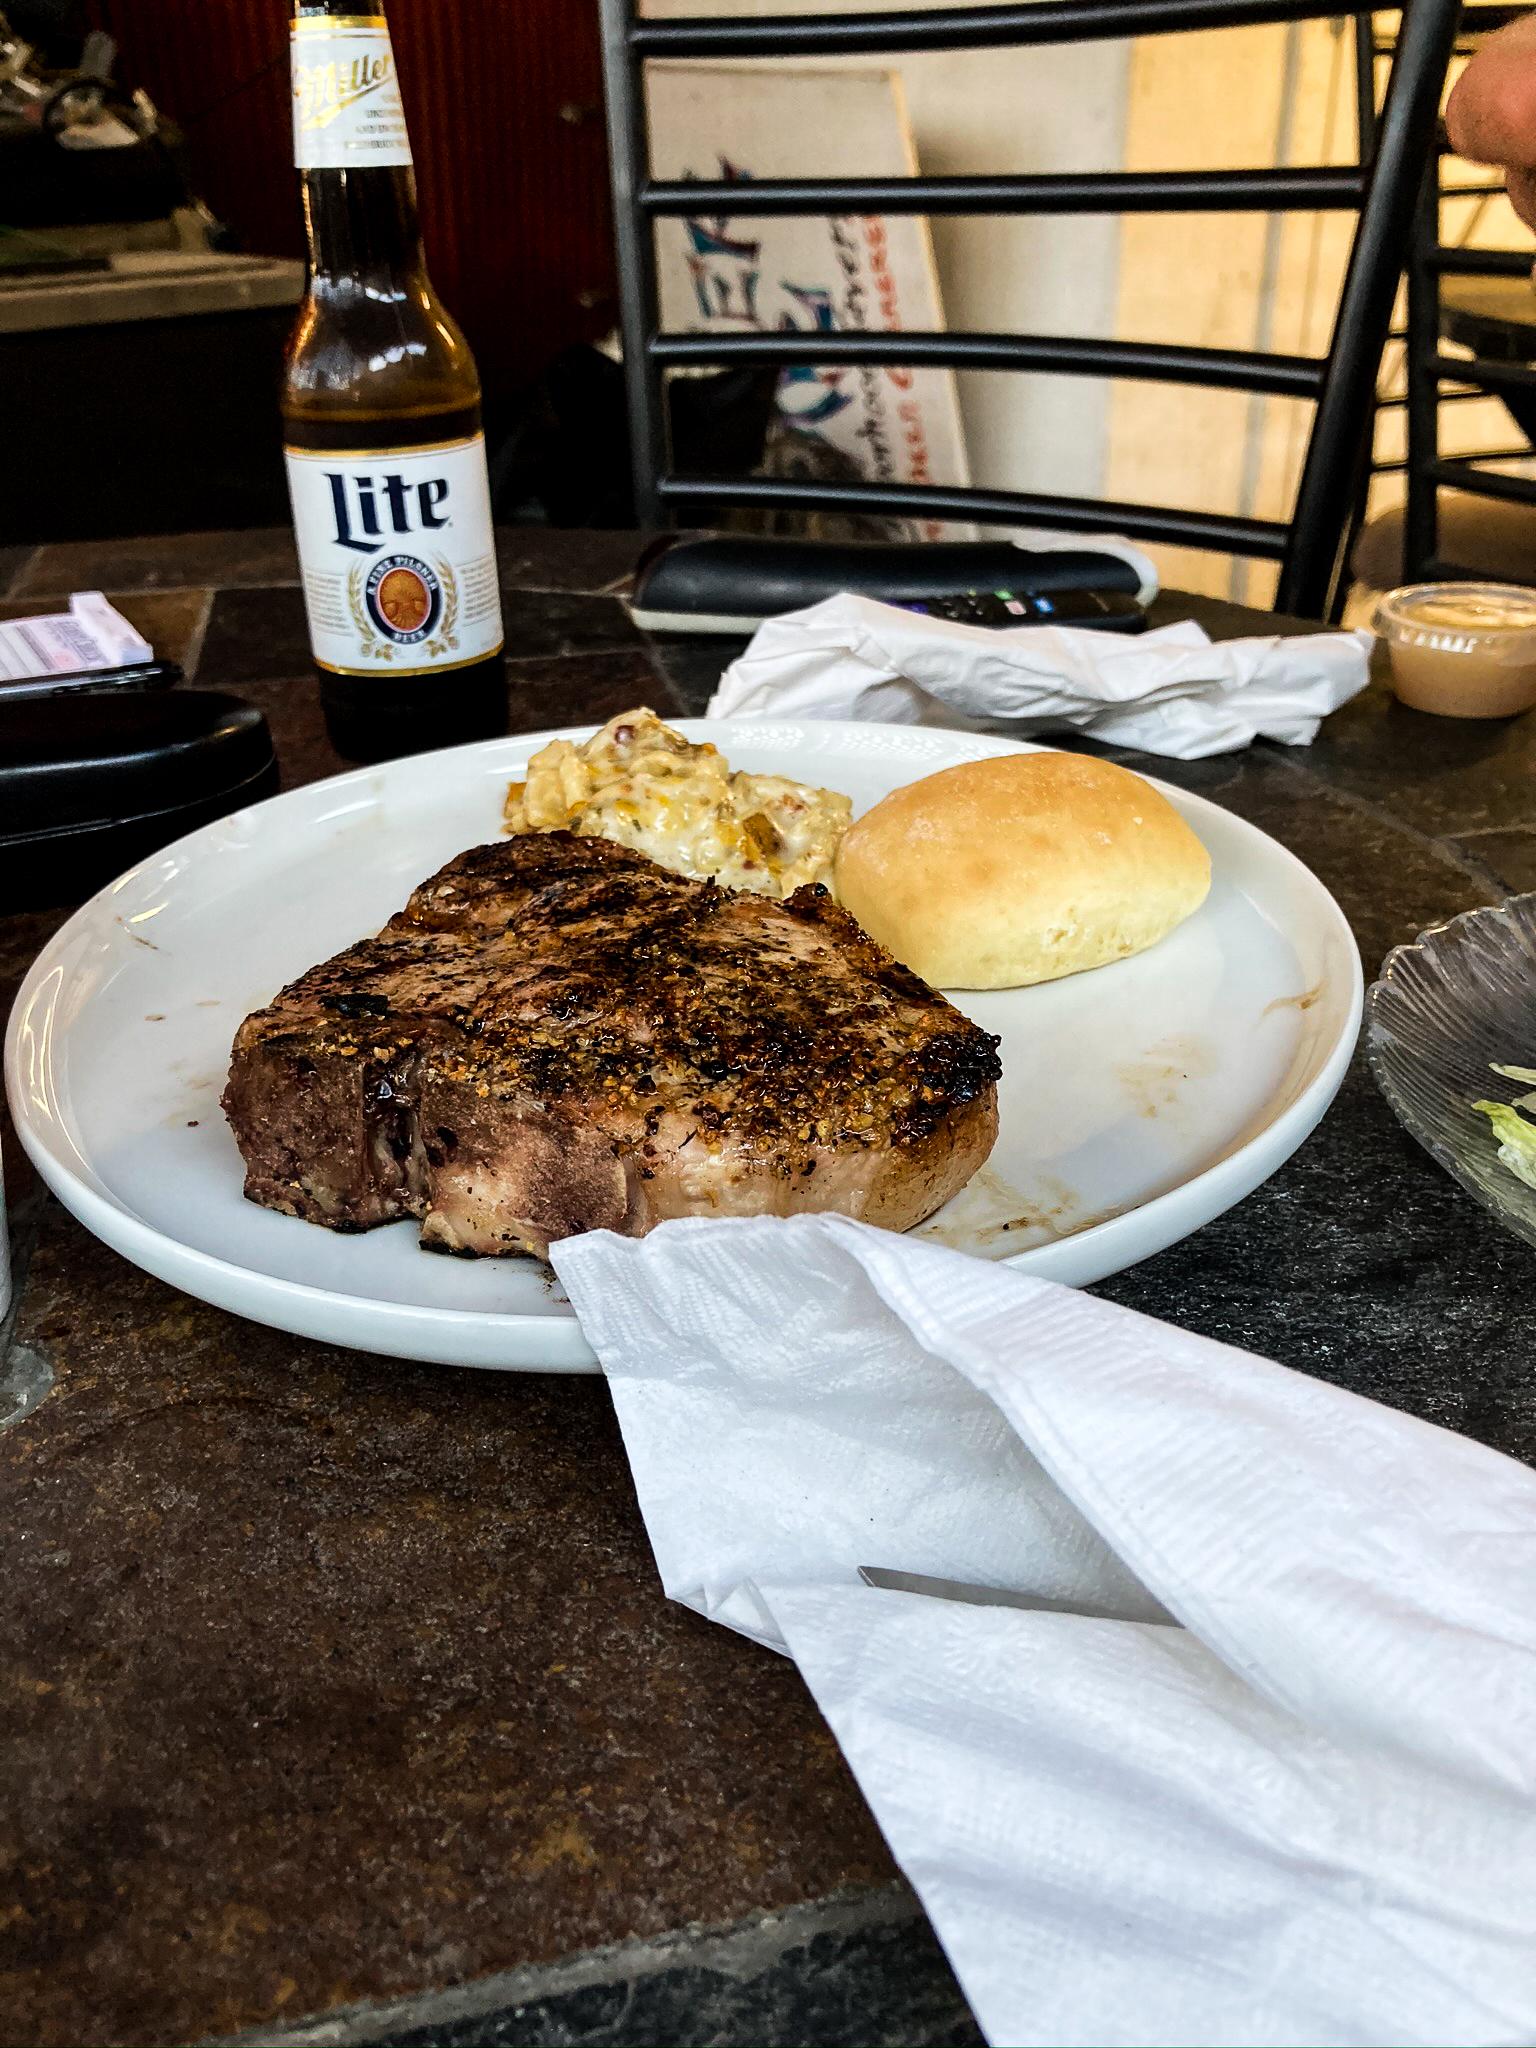 The Corner bar food near Natchez Trace Parkway